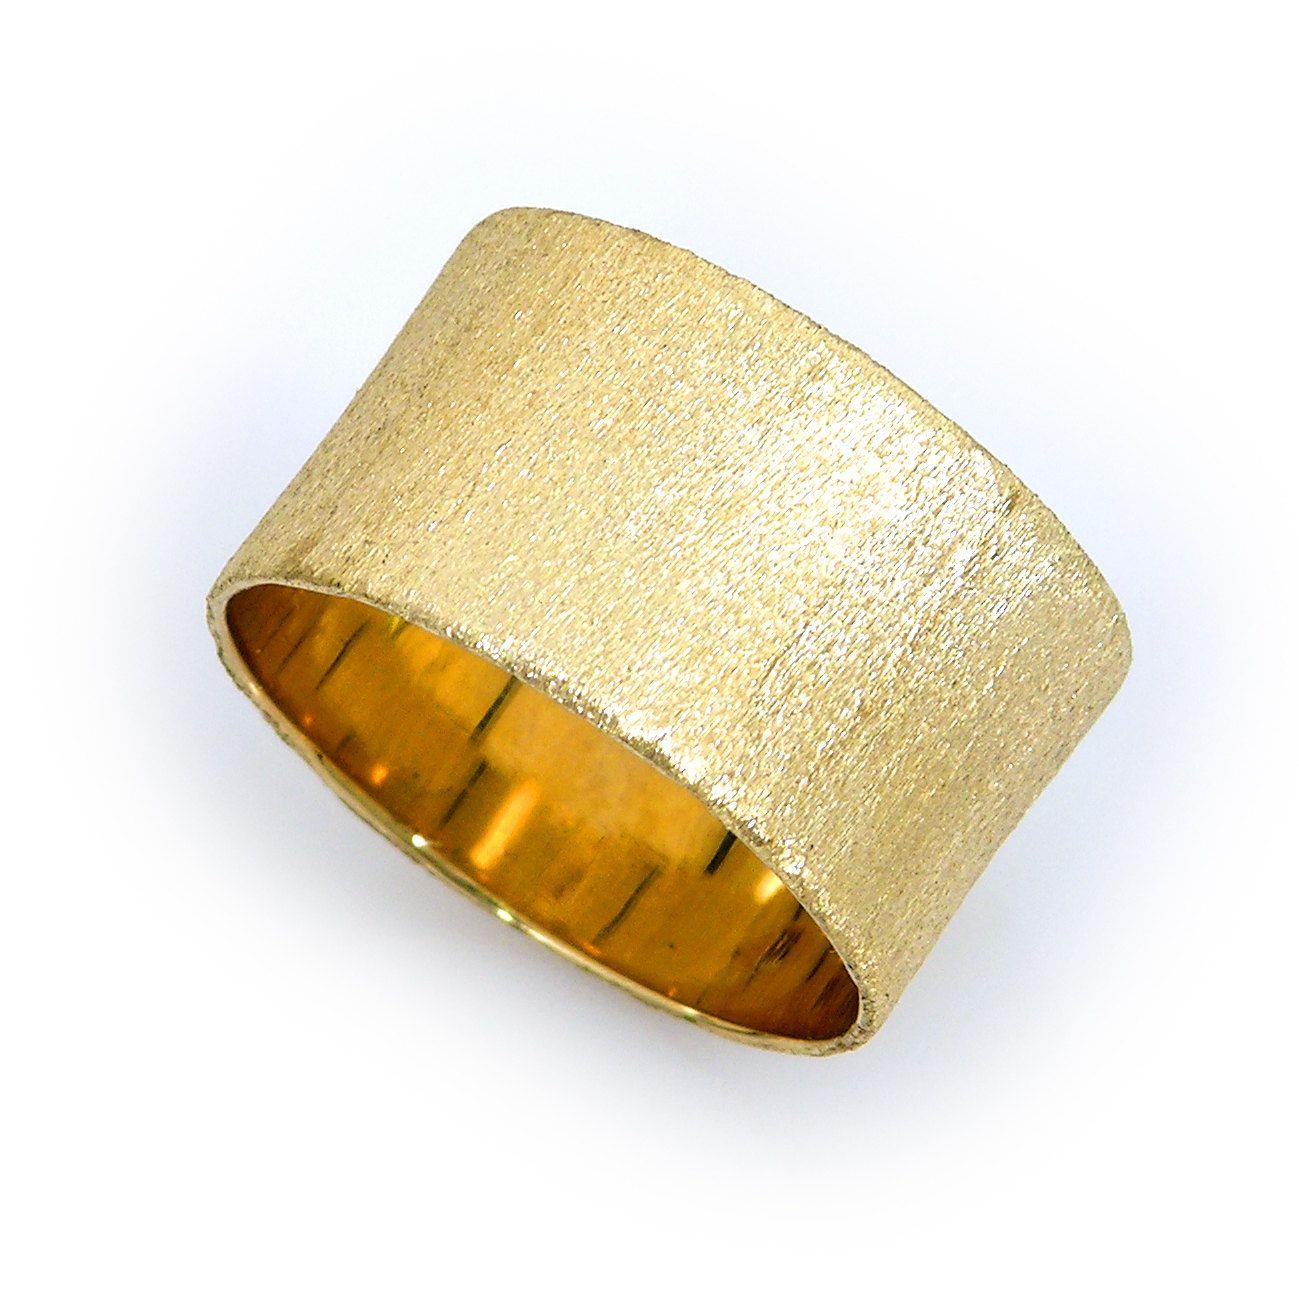 Thick yellow gold band dum dum du duuuum pinterest gold